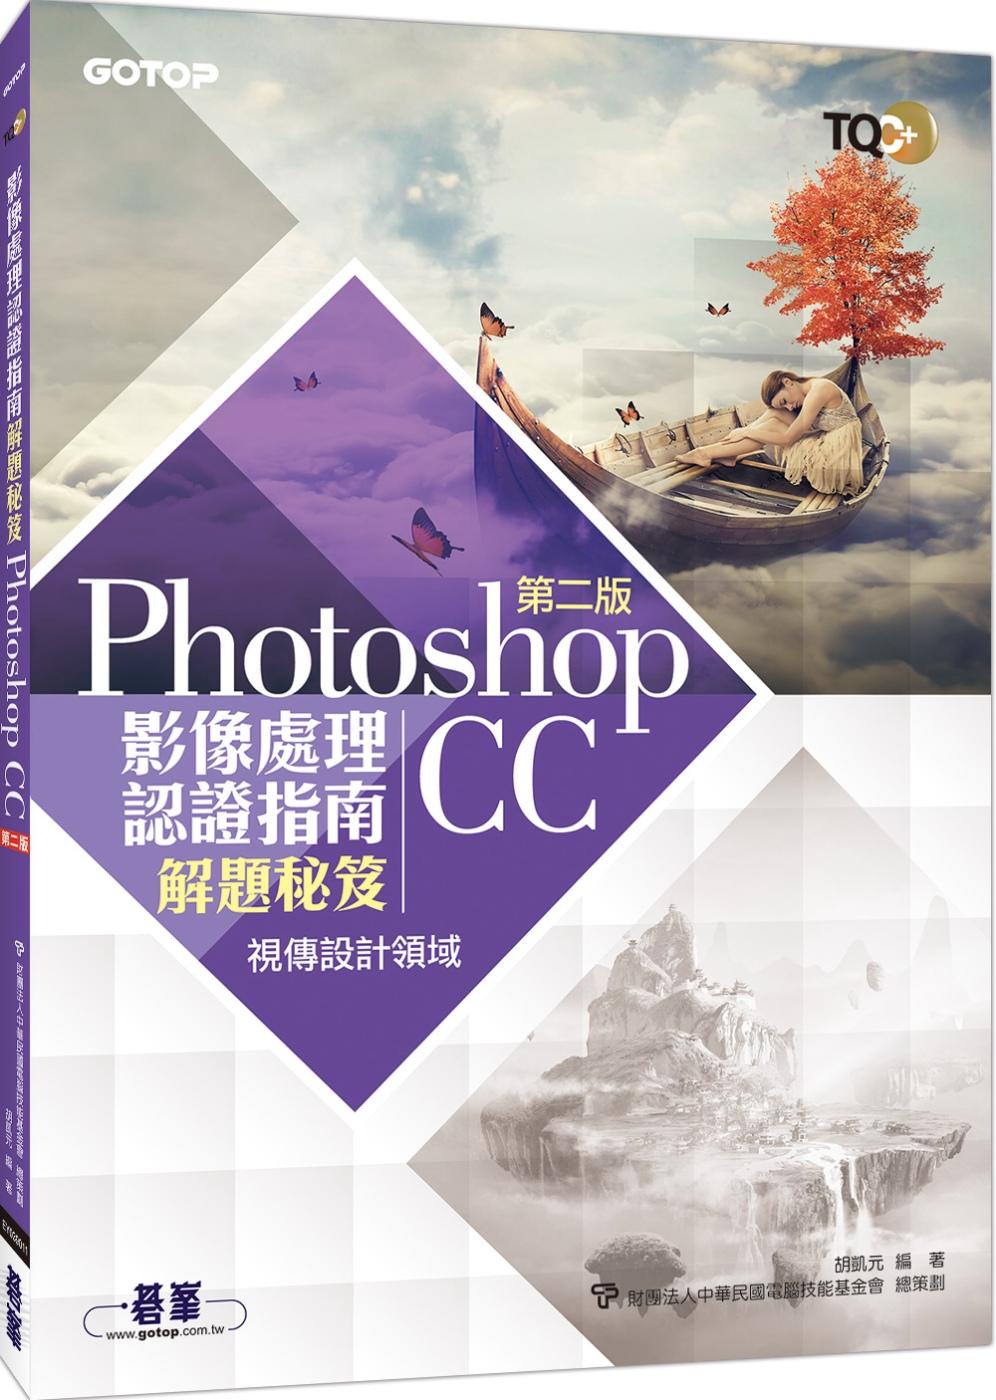 TQC+ 影像處理認證指南解題秘笈:Photoshop CC(第二版)